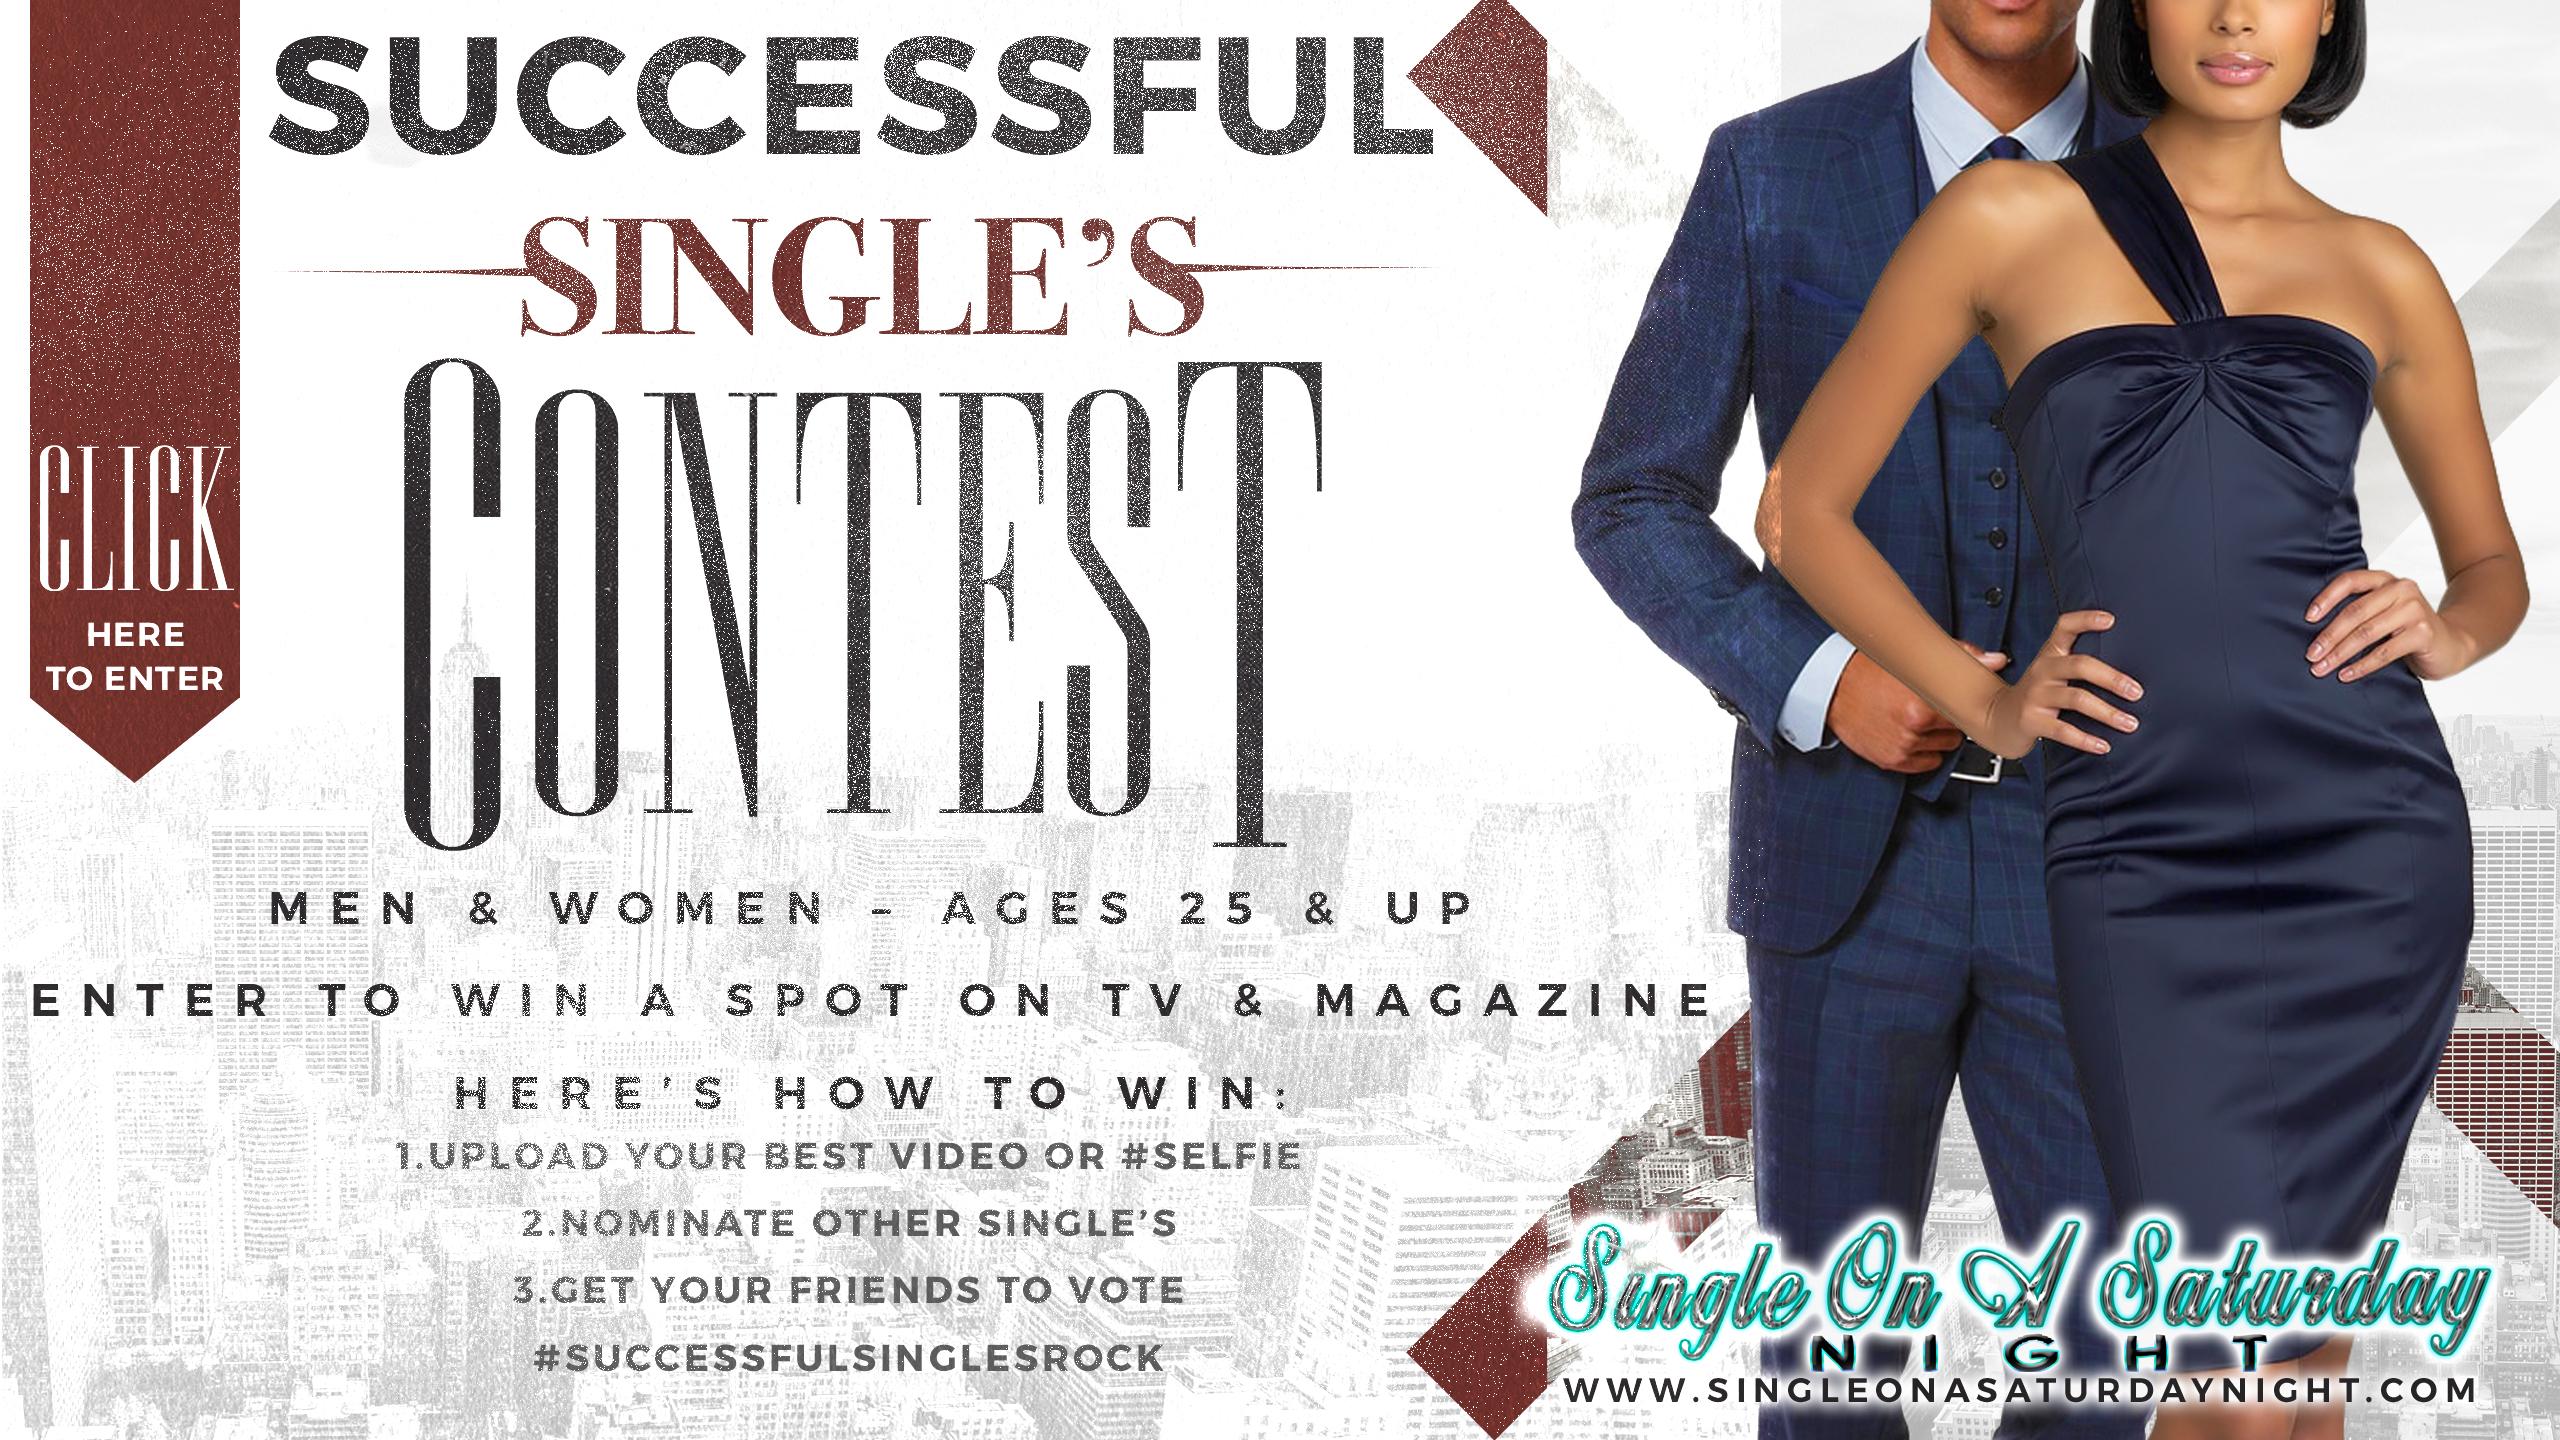 Are You A Successful Single?